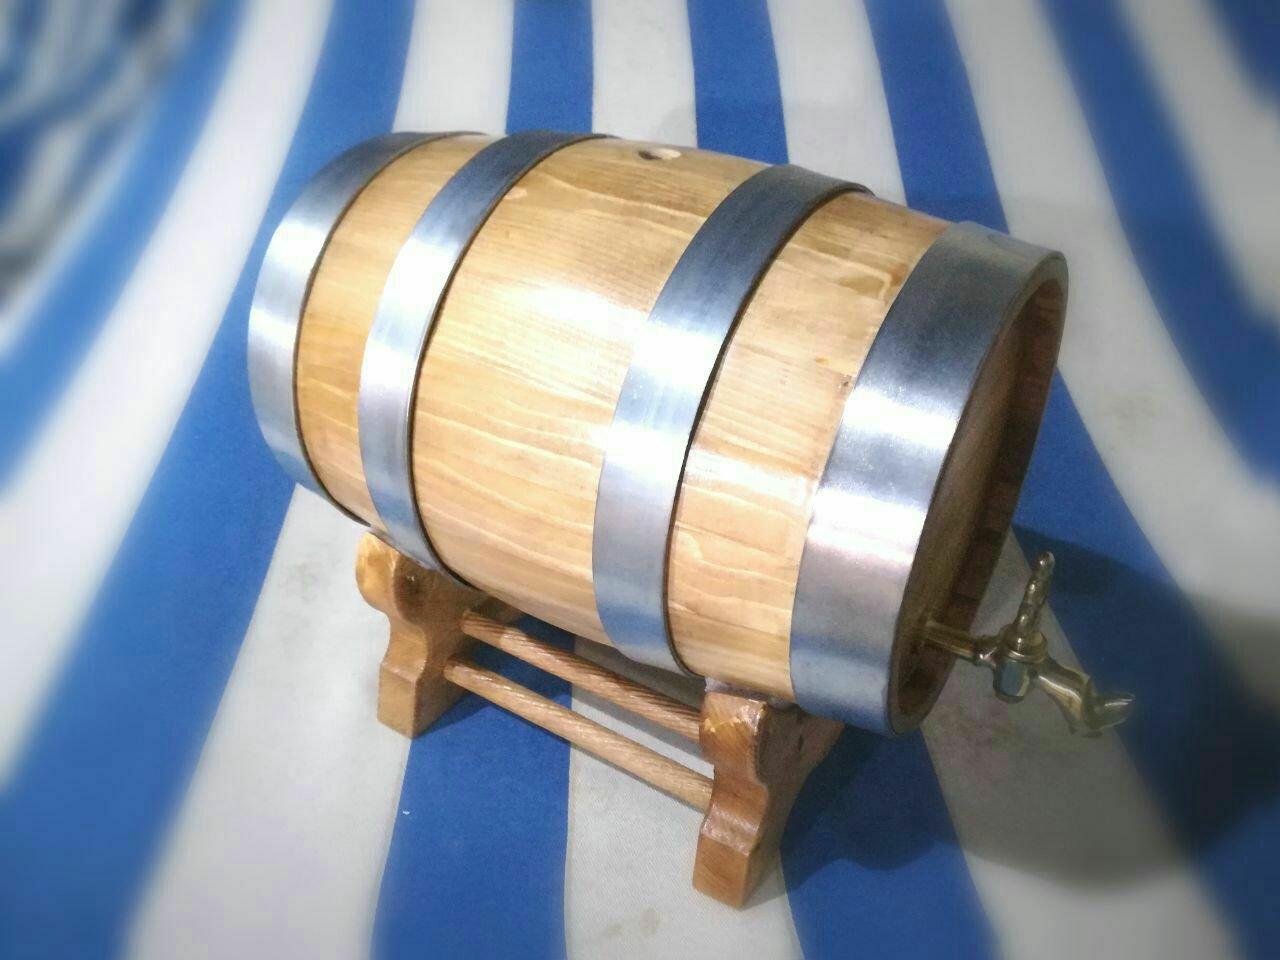 بشکه چوب کاج با تسمه فولادی، نمونه کار دکوراسیون داخلی